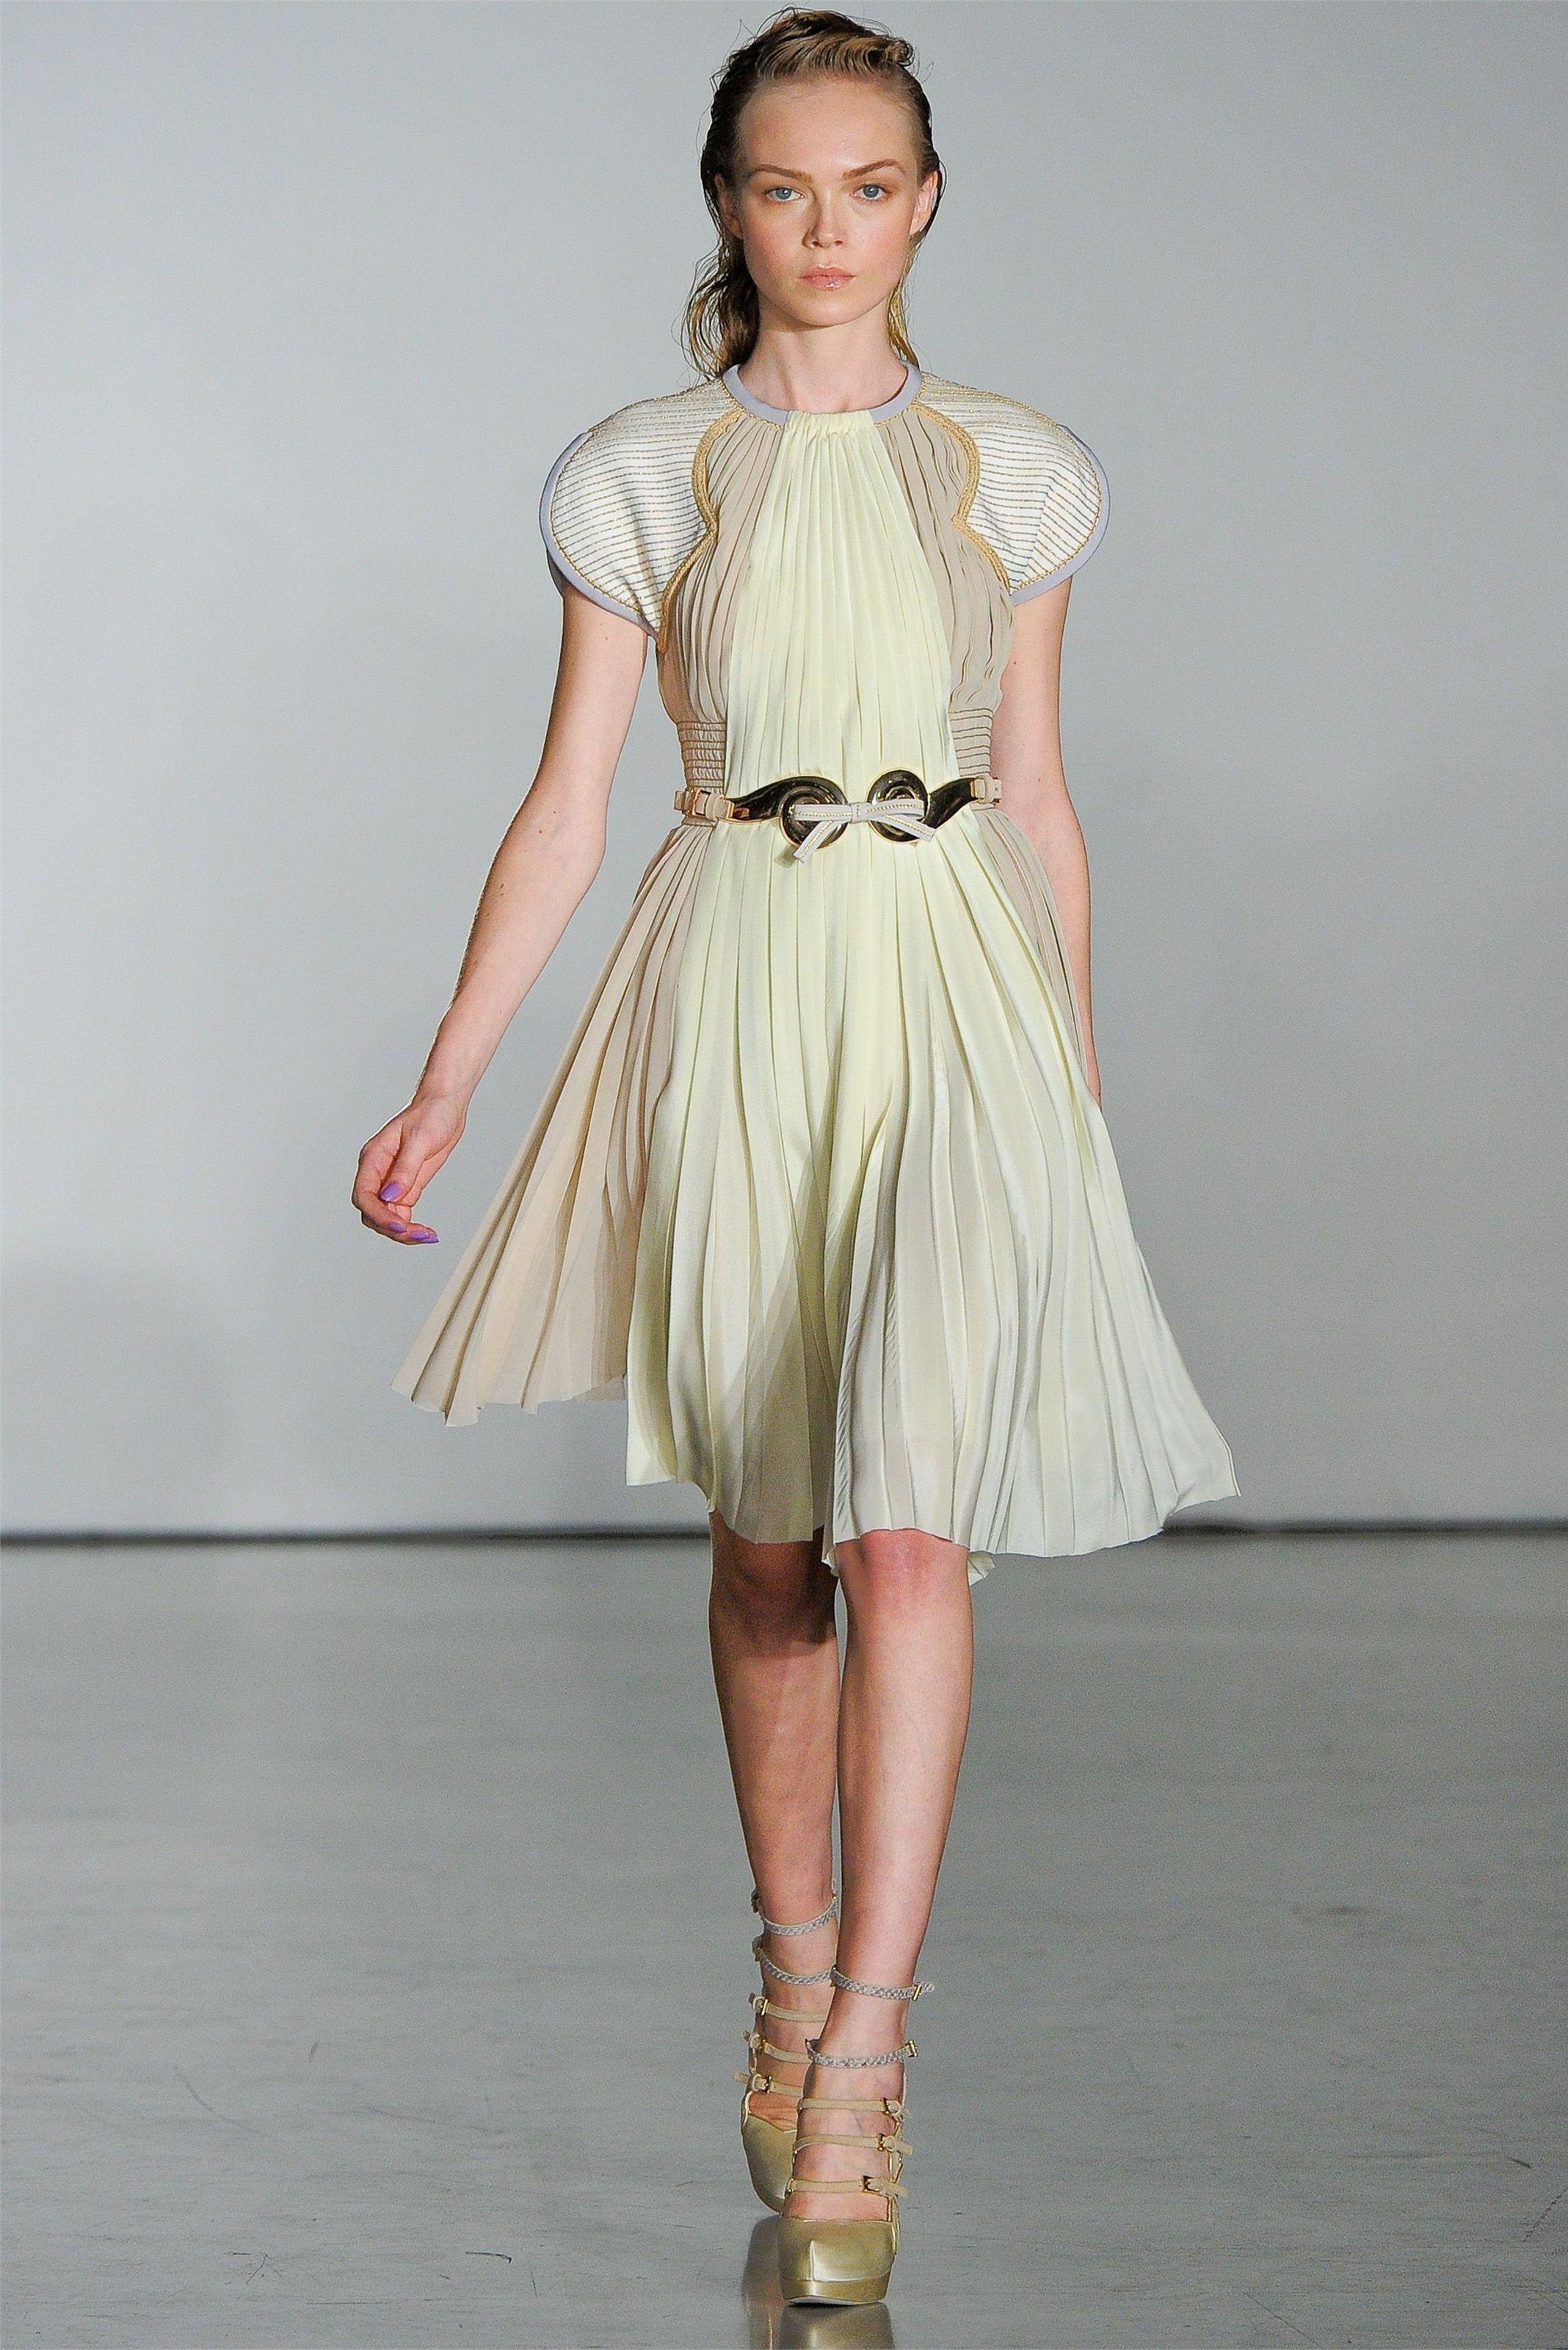 Aquilano rimondi dresses pinterest beautiful gowns couture